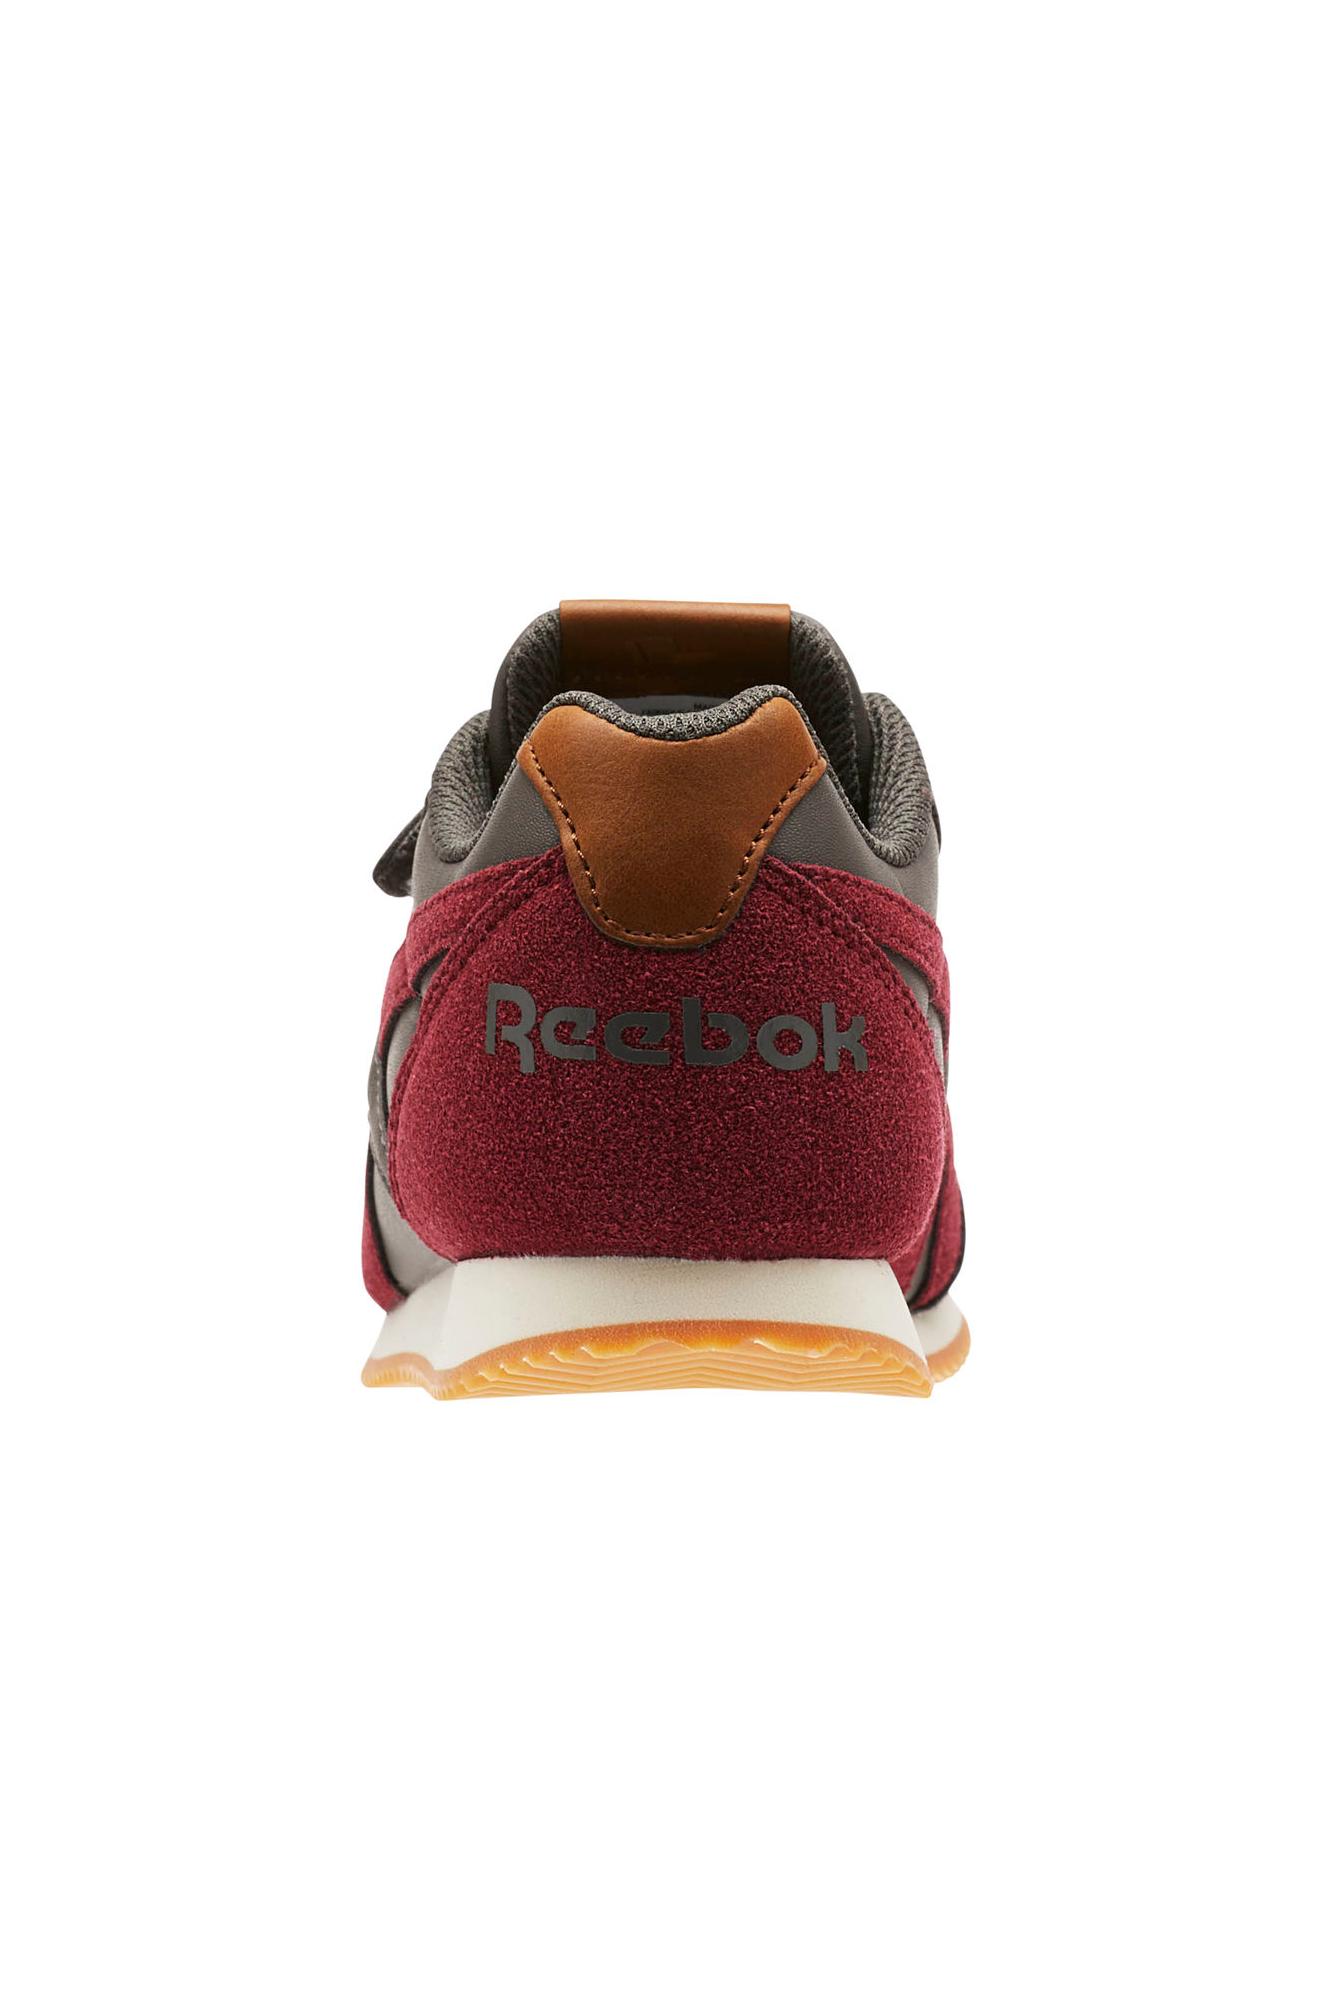 7613bd16e9e Buty Reebok Royal Classic Jogger 2.0 2V - CN4817   Na co dzień ...